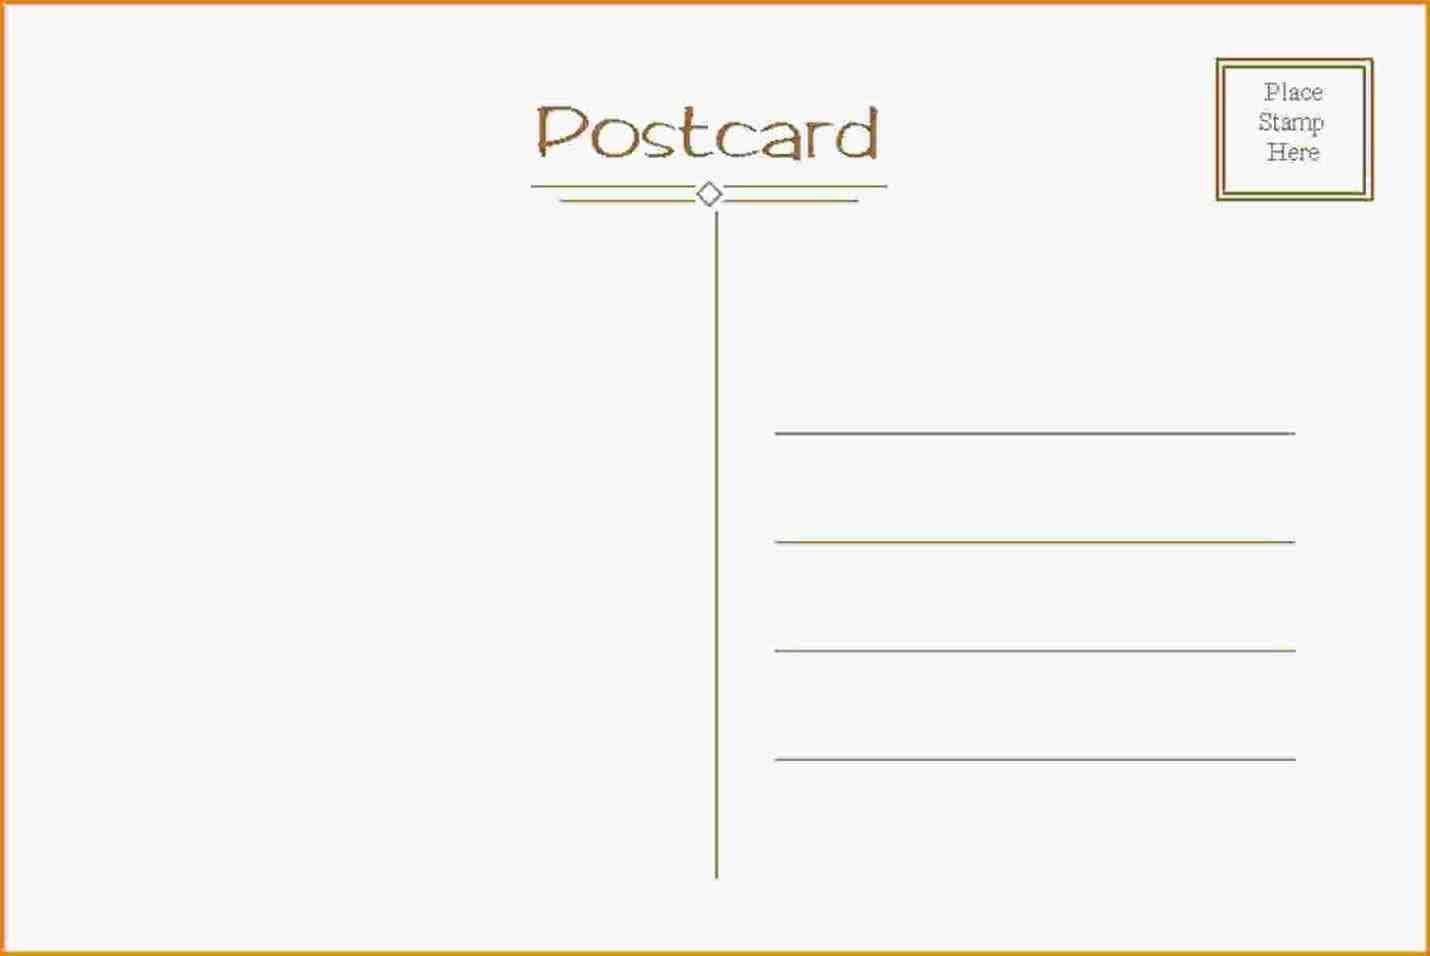 Postcards template rsvp postcard cards online print on wordings free postcards template rsvp postcard cards online print on wordings free psd template together with wordings rsvp maxwellsz